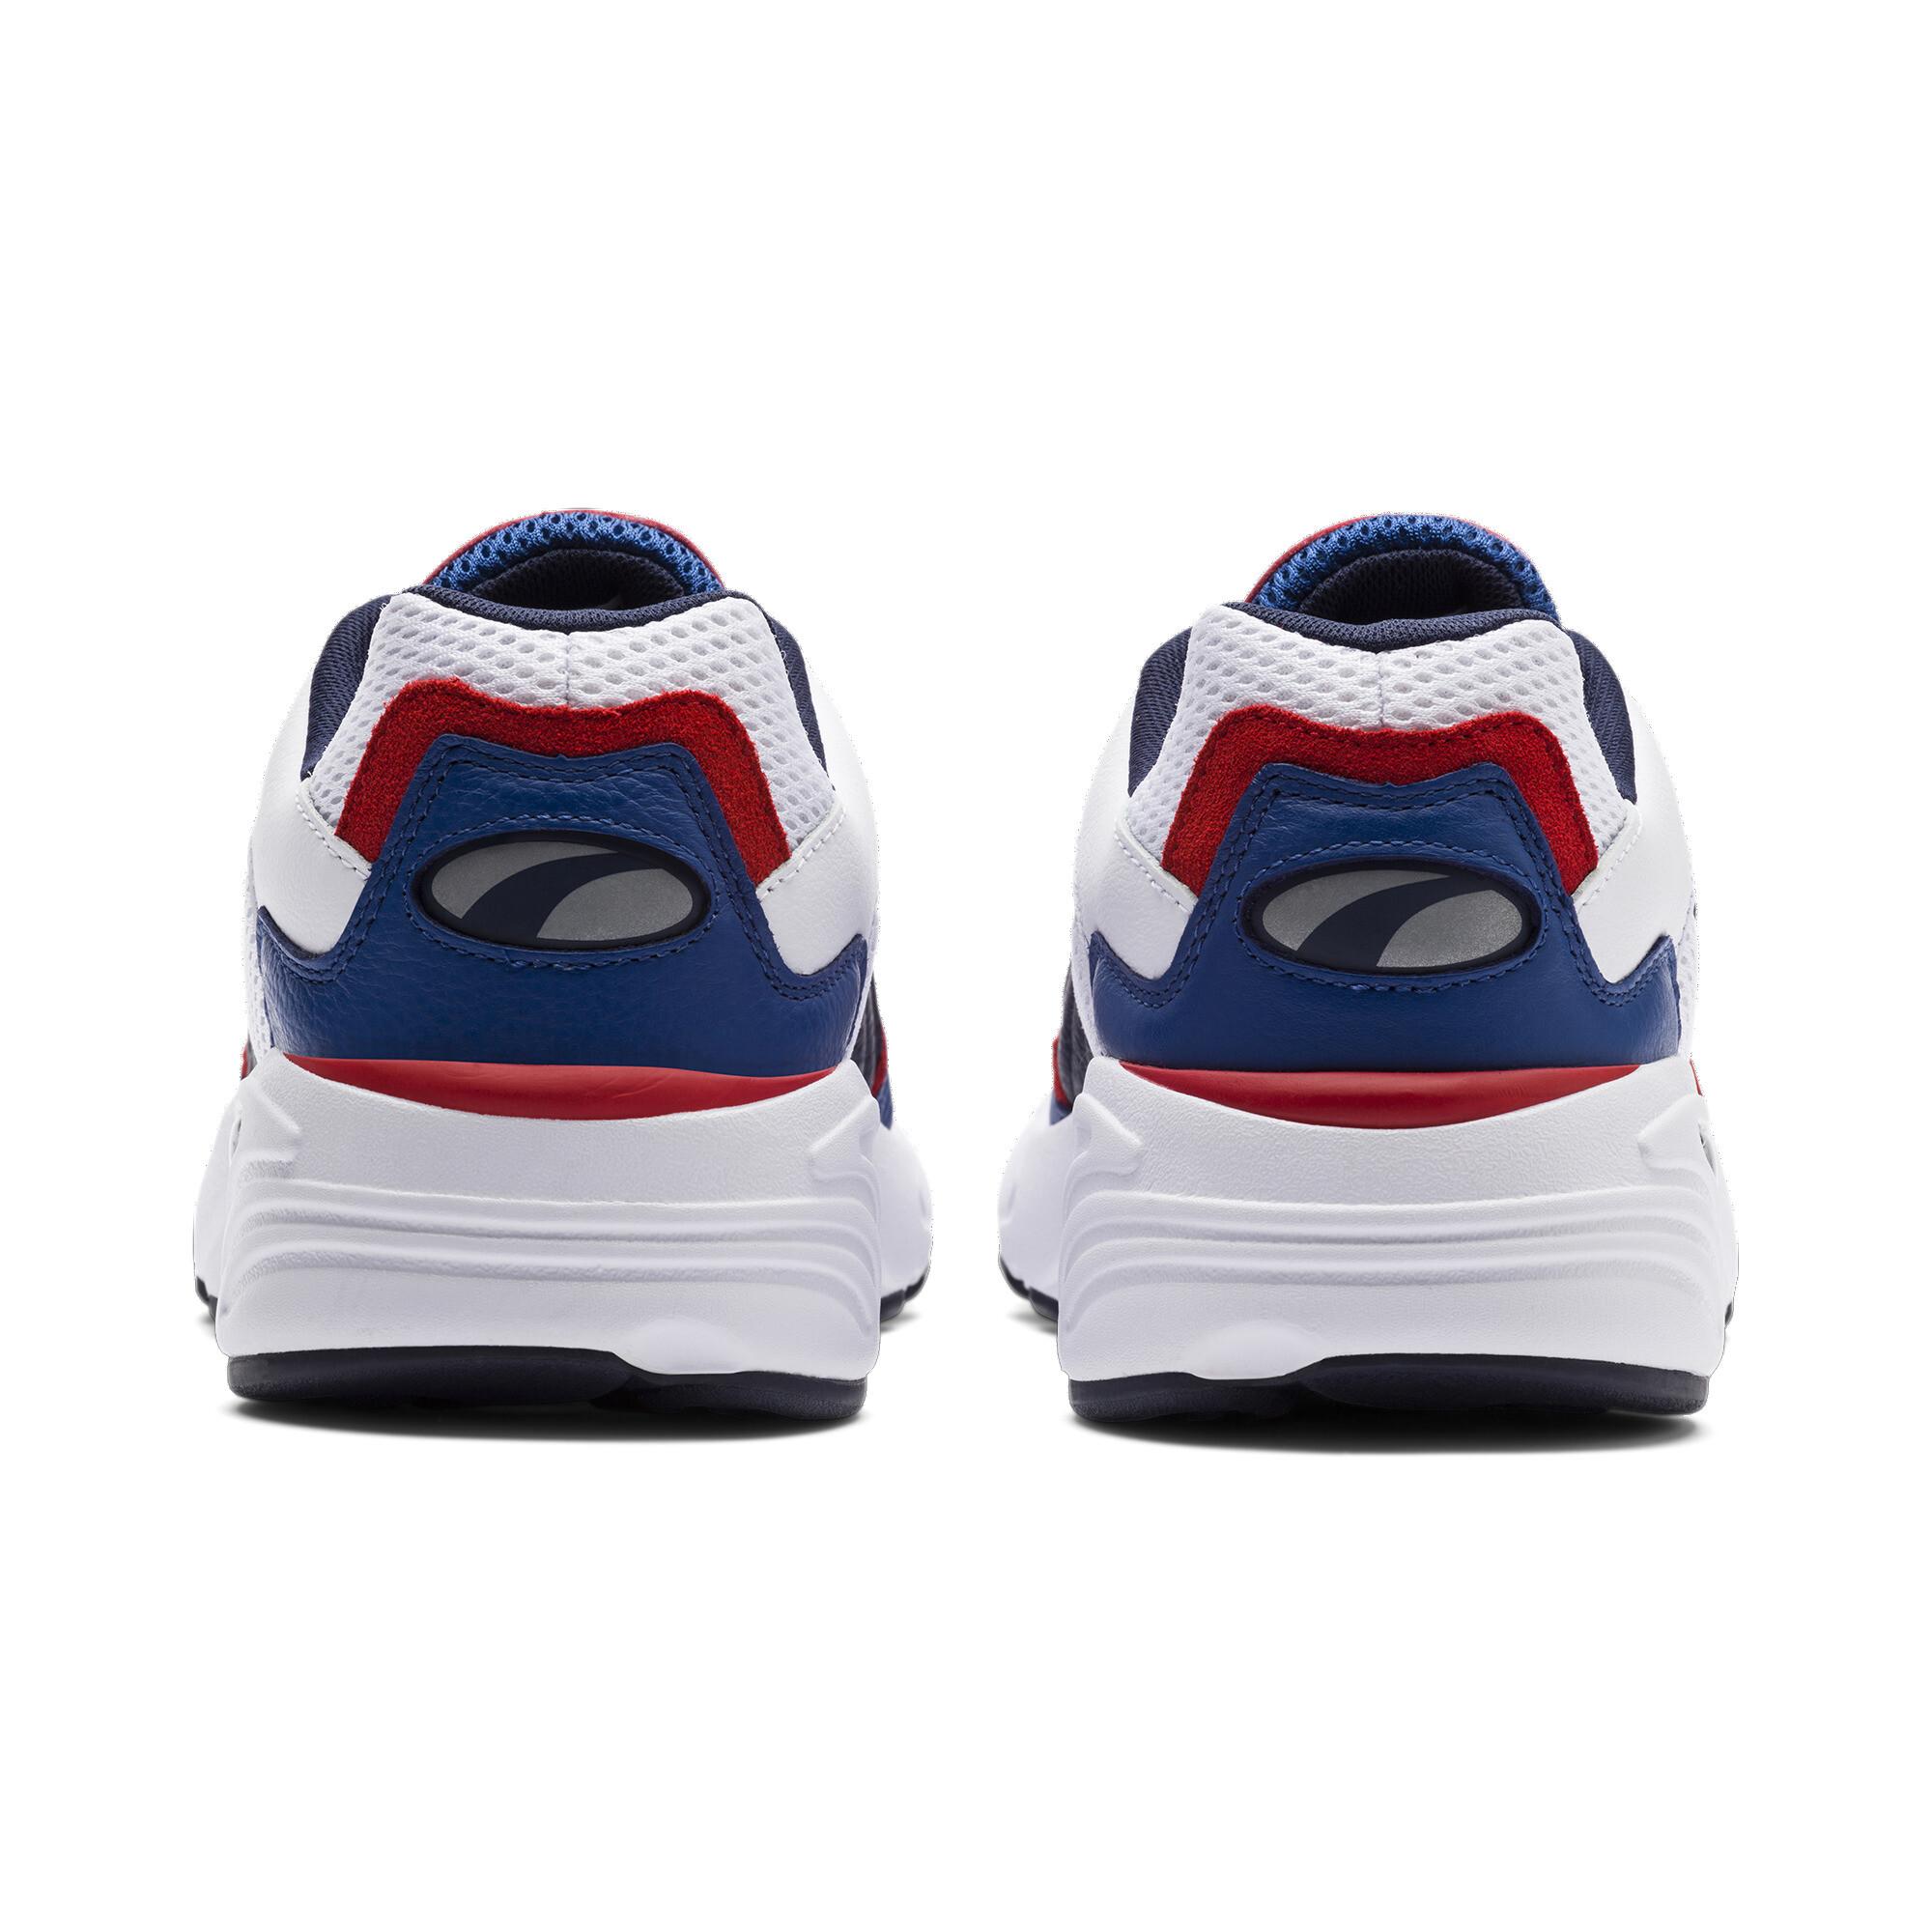 Indexbild 9 - PUMA CELL Viper Leather Sneaker Unisex Schuhe Sport Classics Neu